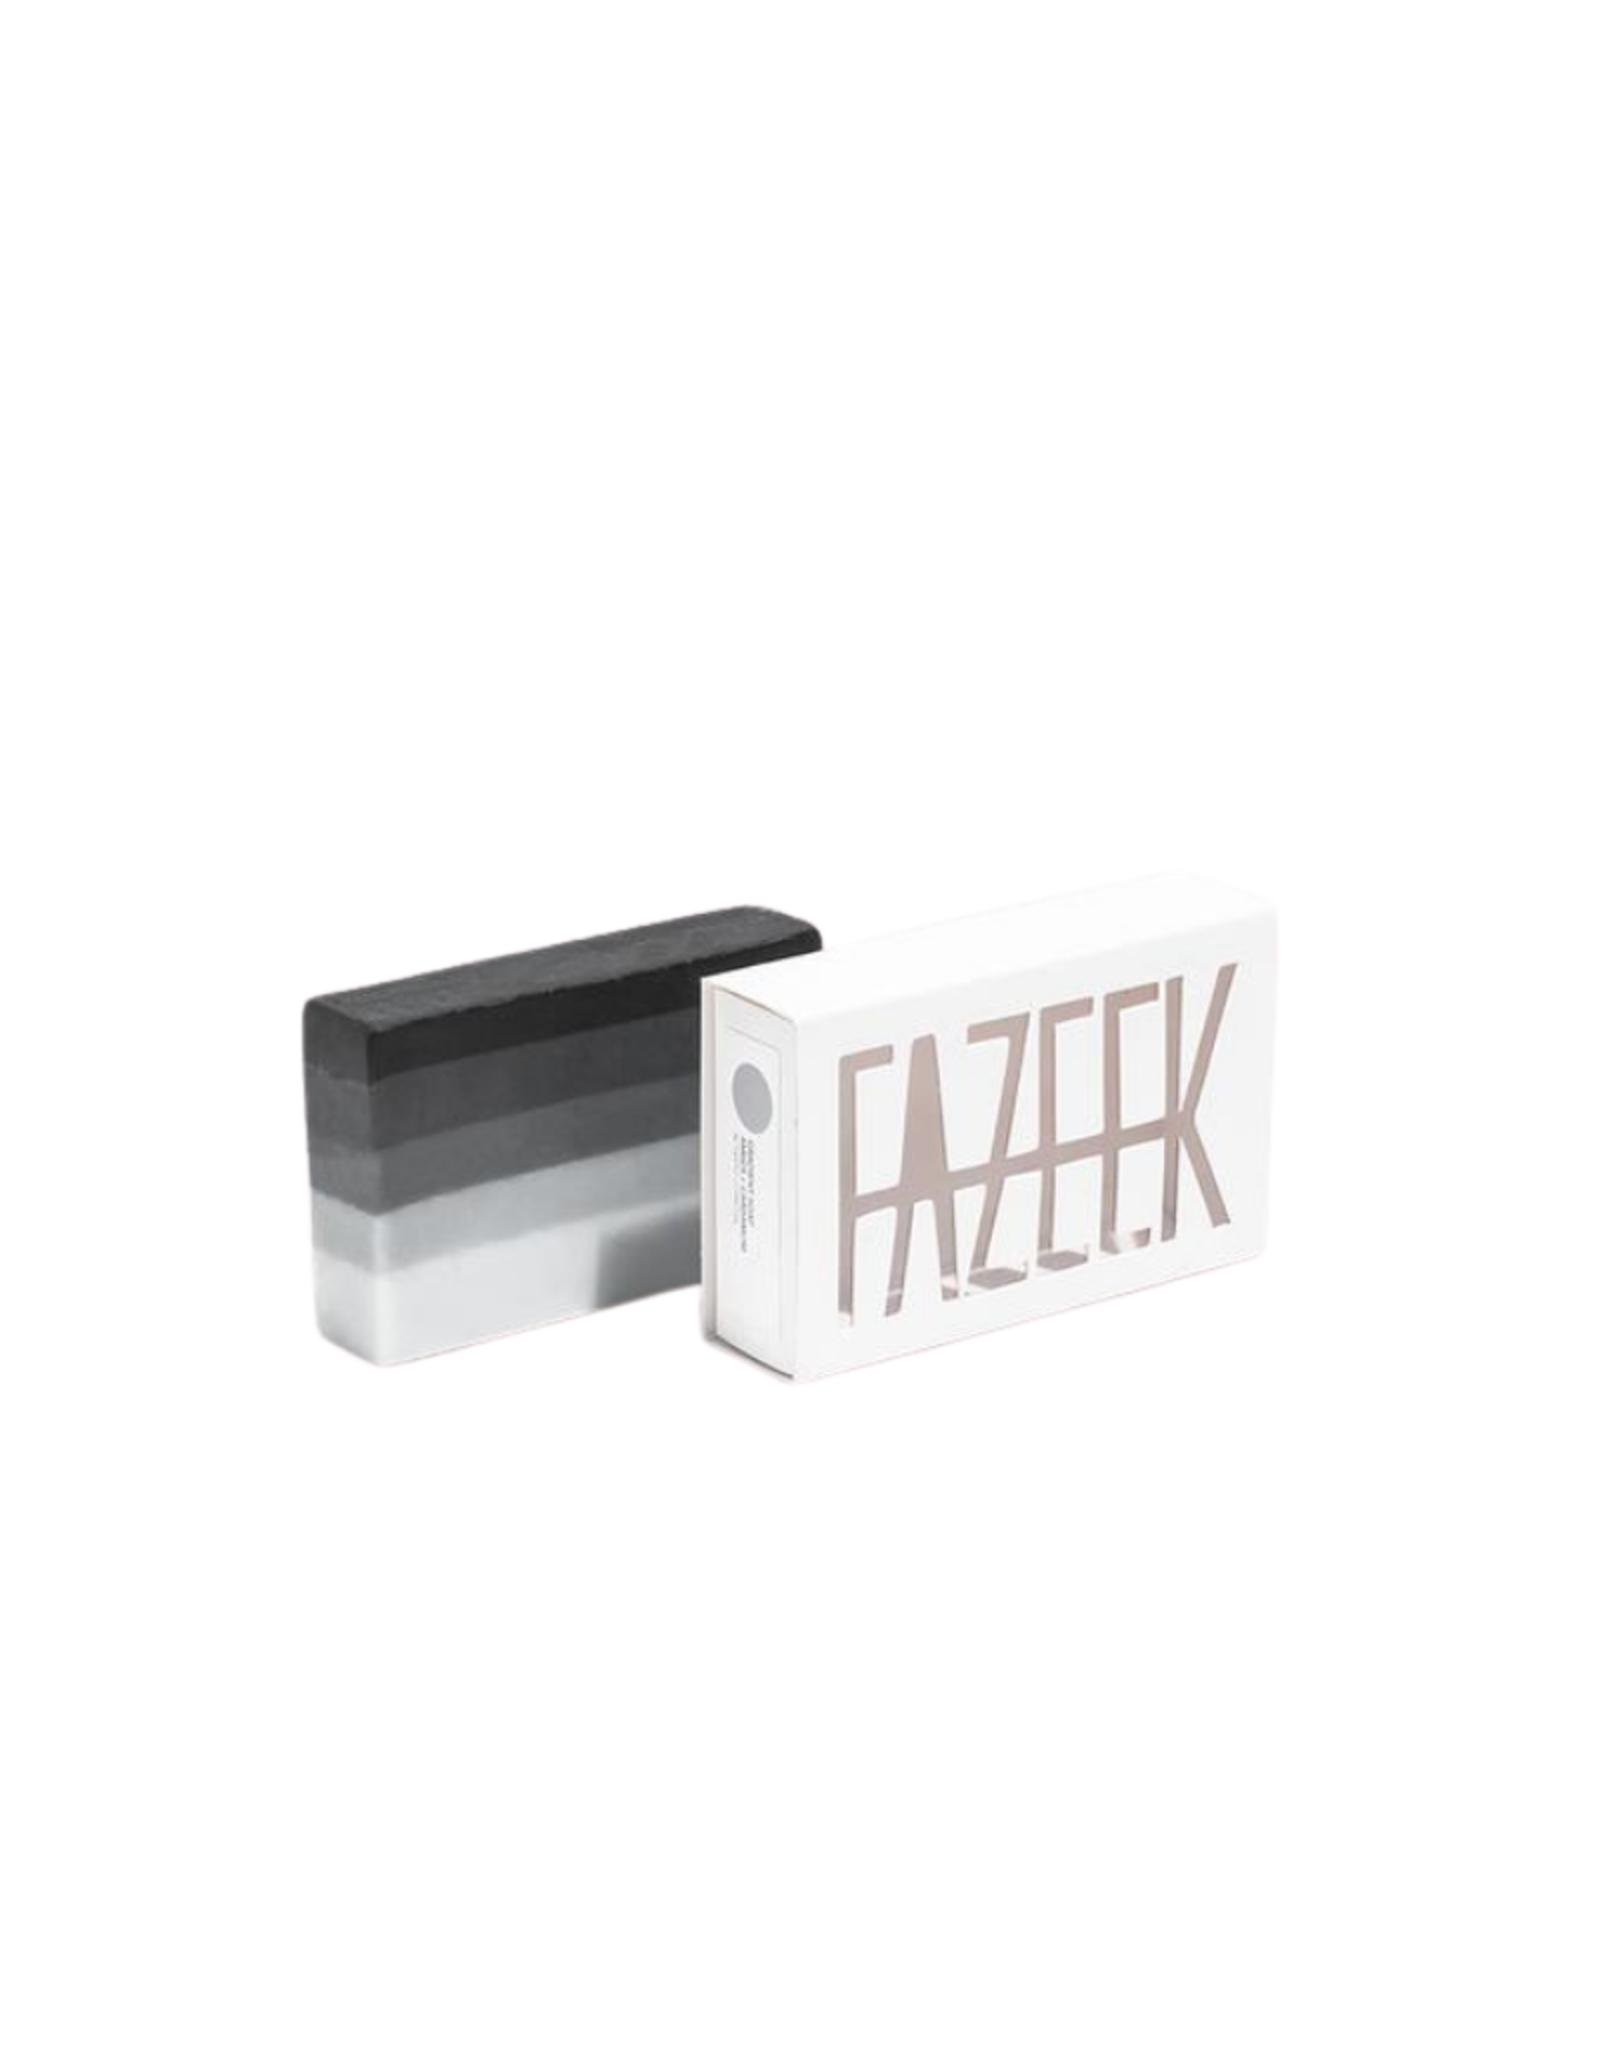 Fazeek Gradient Soap - Amber+Cardamom